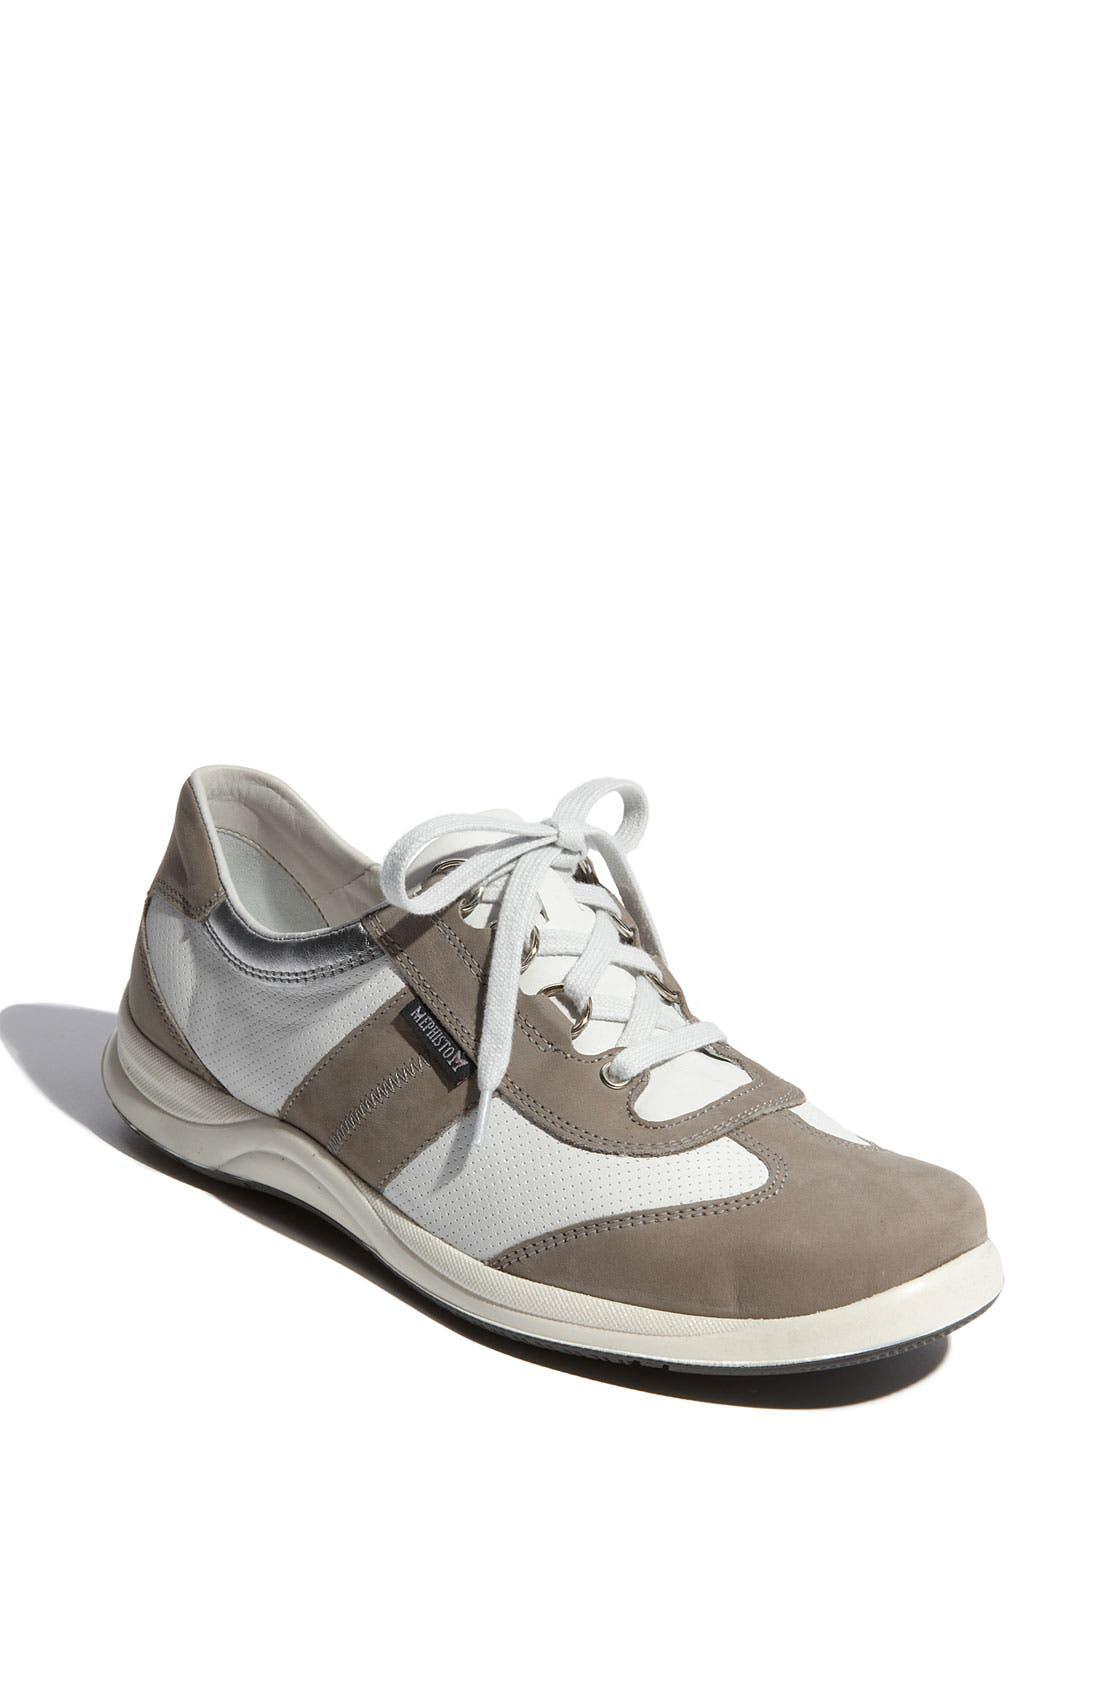 Alternate Image 1 Selected - Mephisto Laser Perforated Walking Shoe (Women)